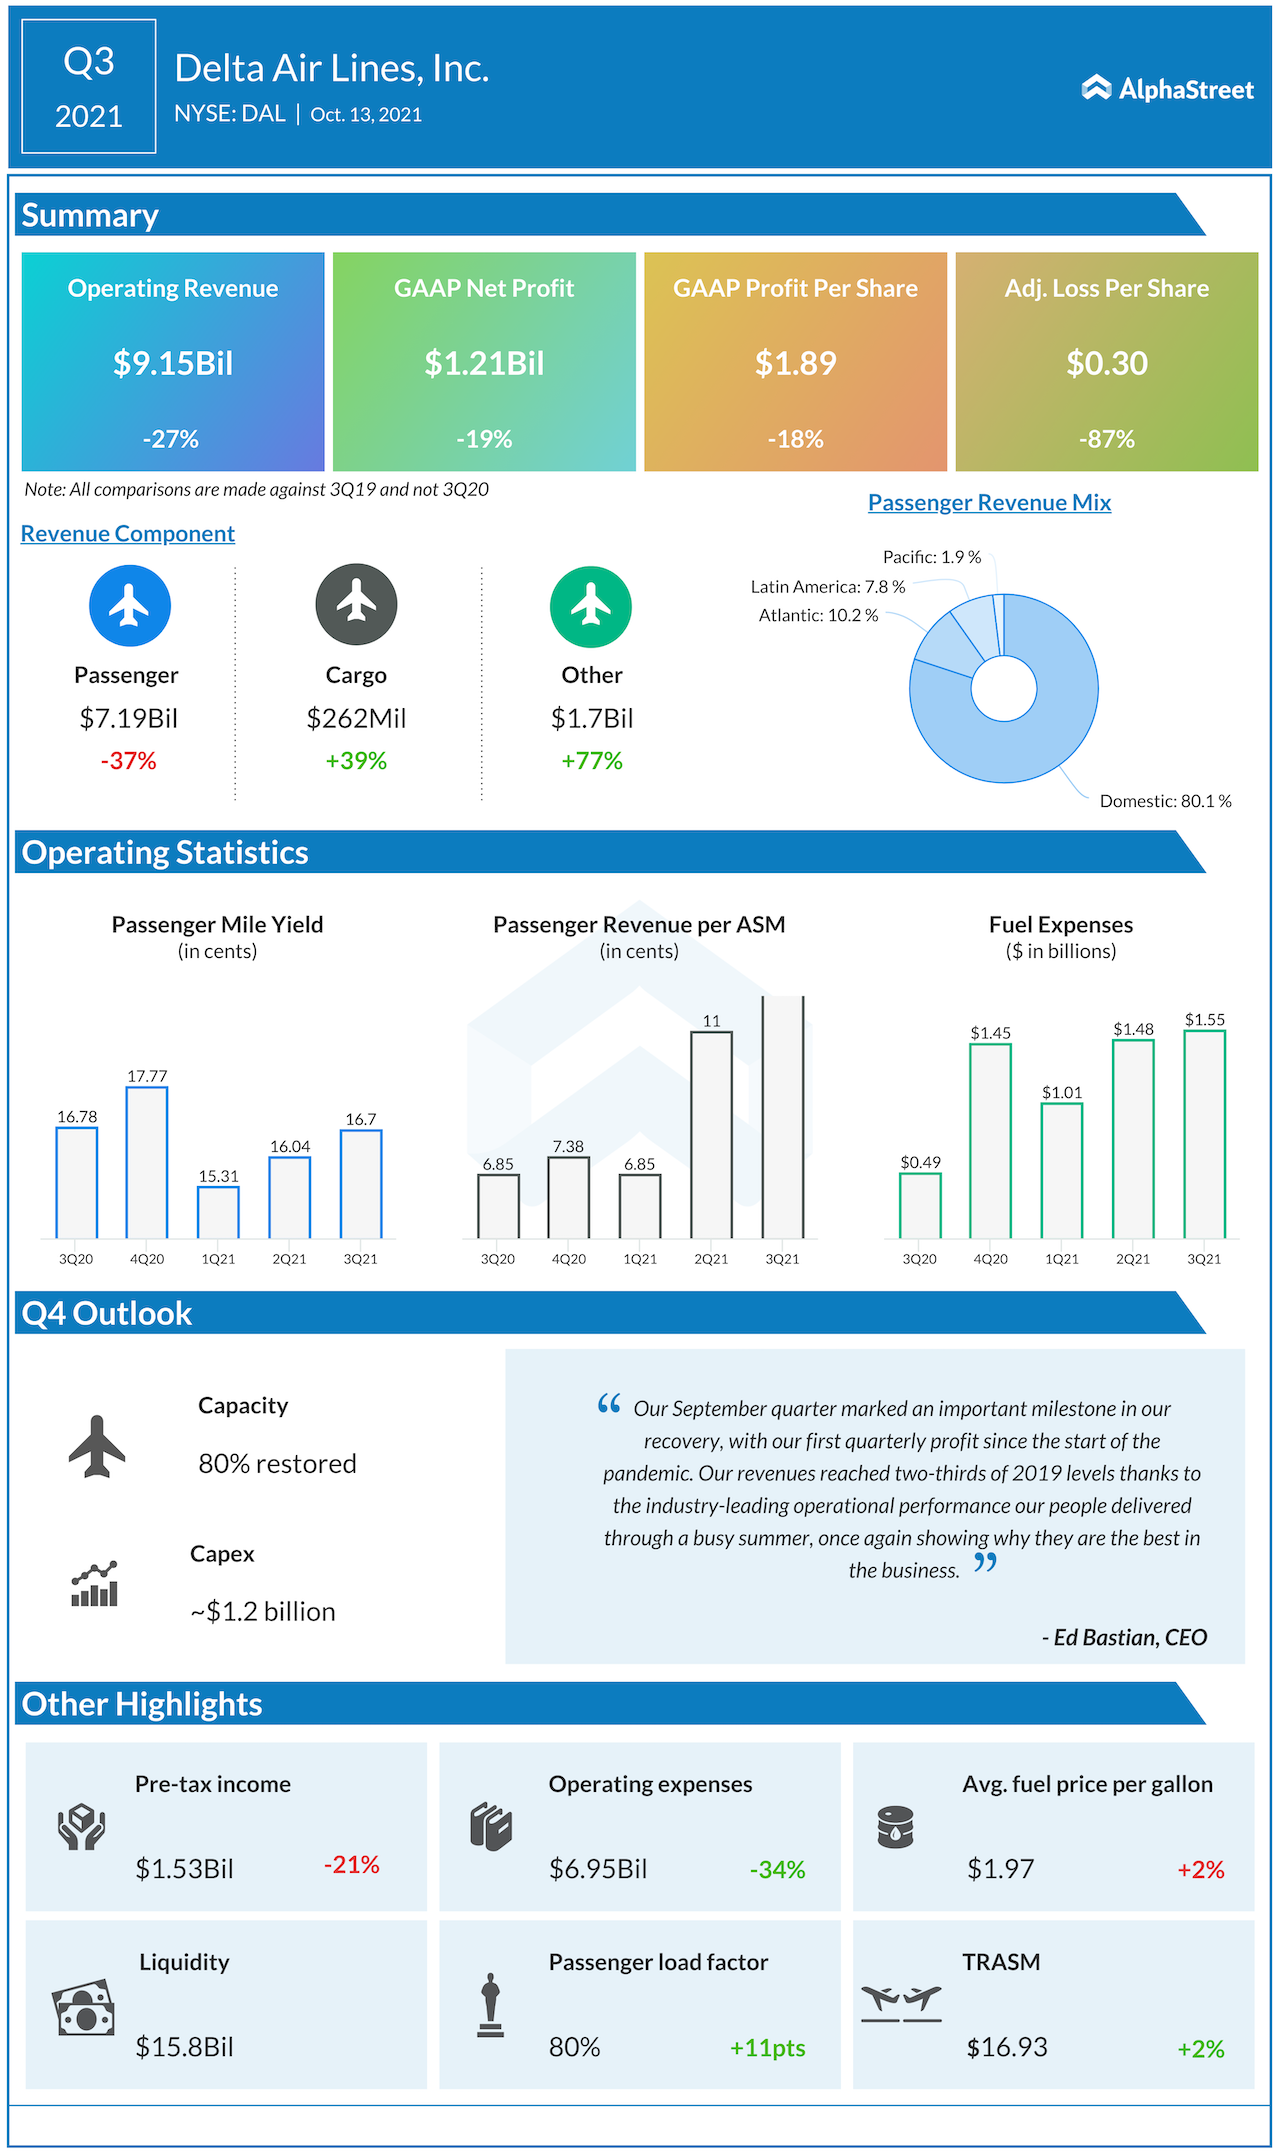 Delta Air Lines Q3 2021 earnings